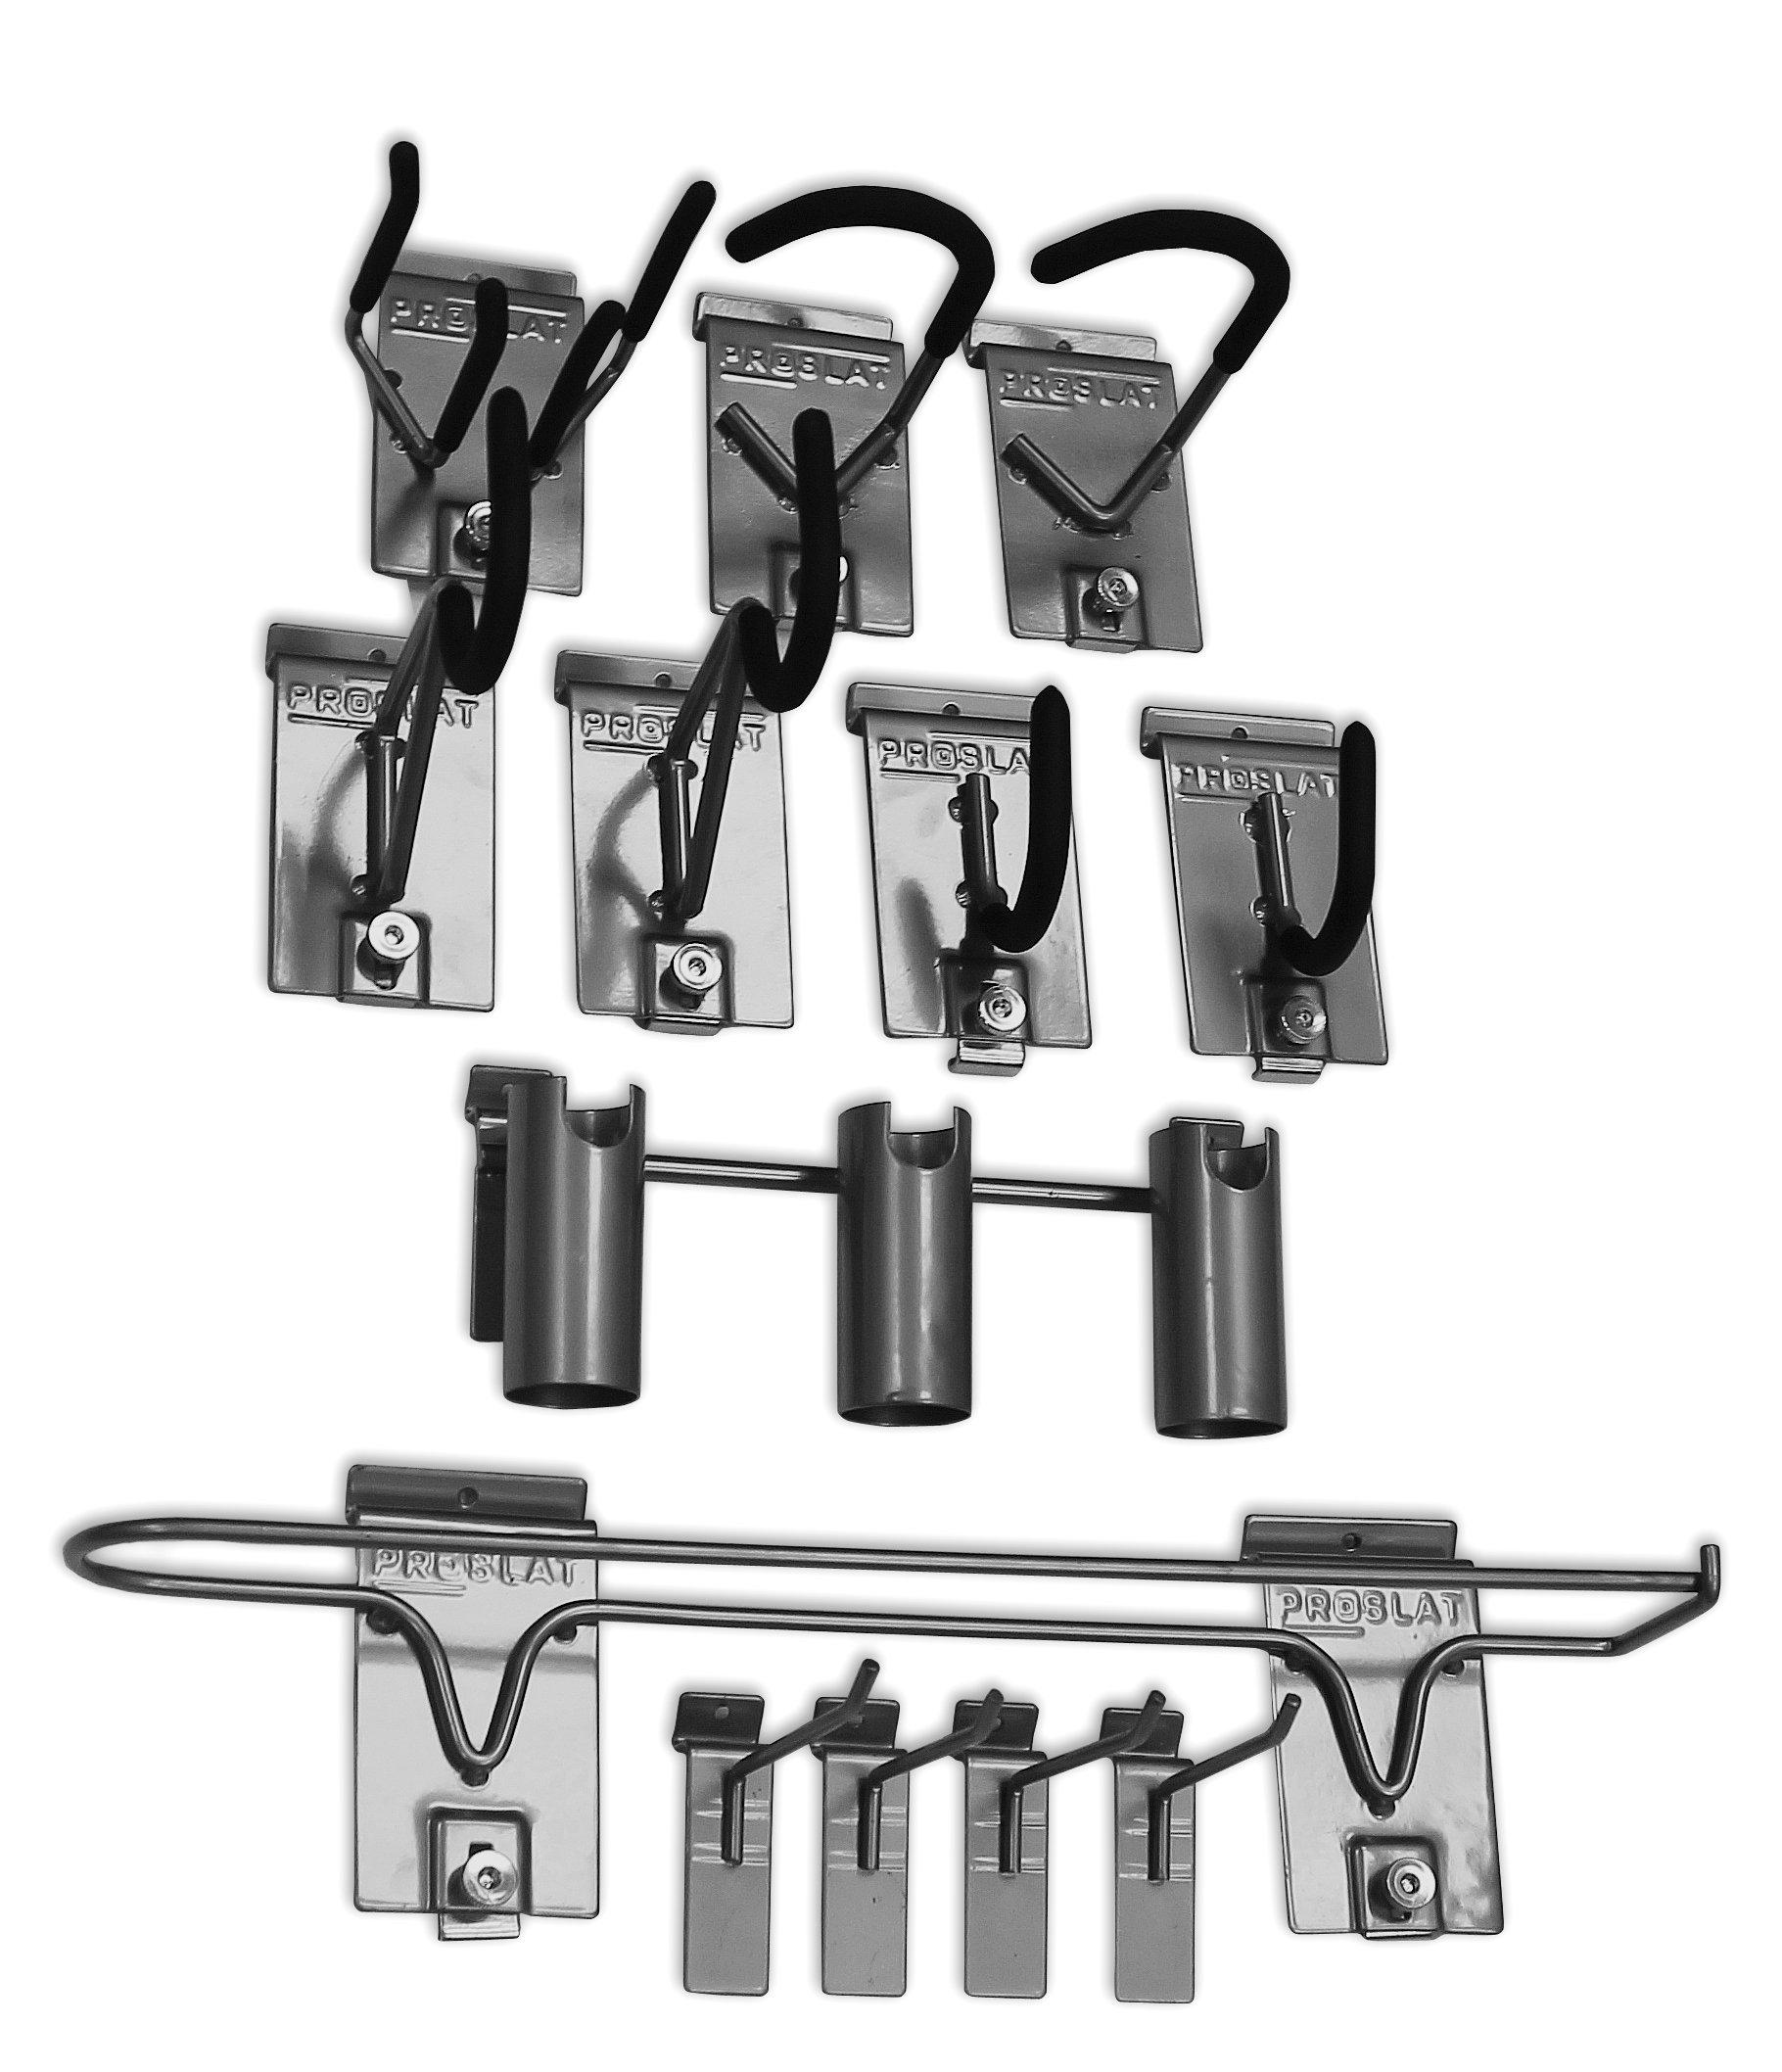 Proslat 11005 Sports Equipment Steel Hook Variety Kit Designed for Proslat PVC Slatwall, 13-Piece